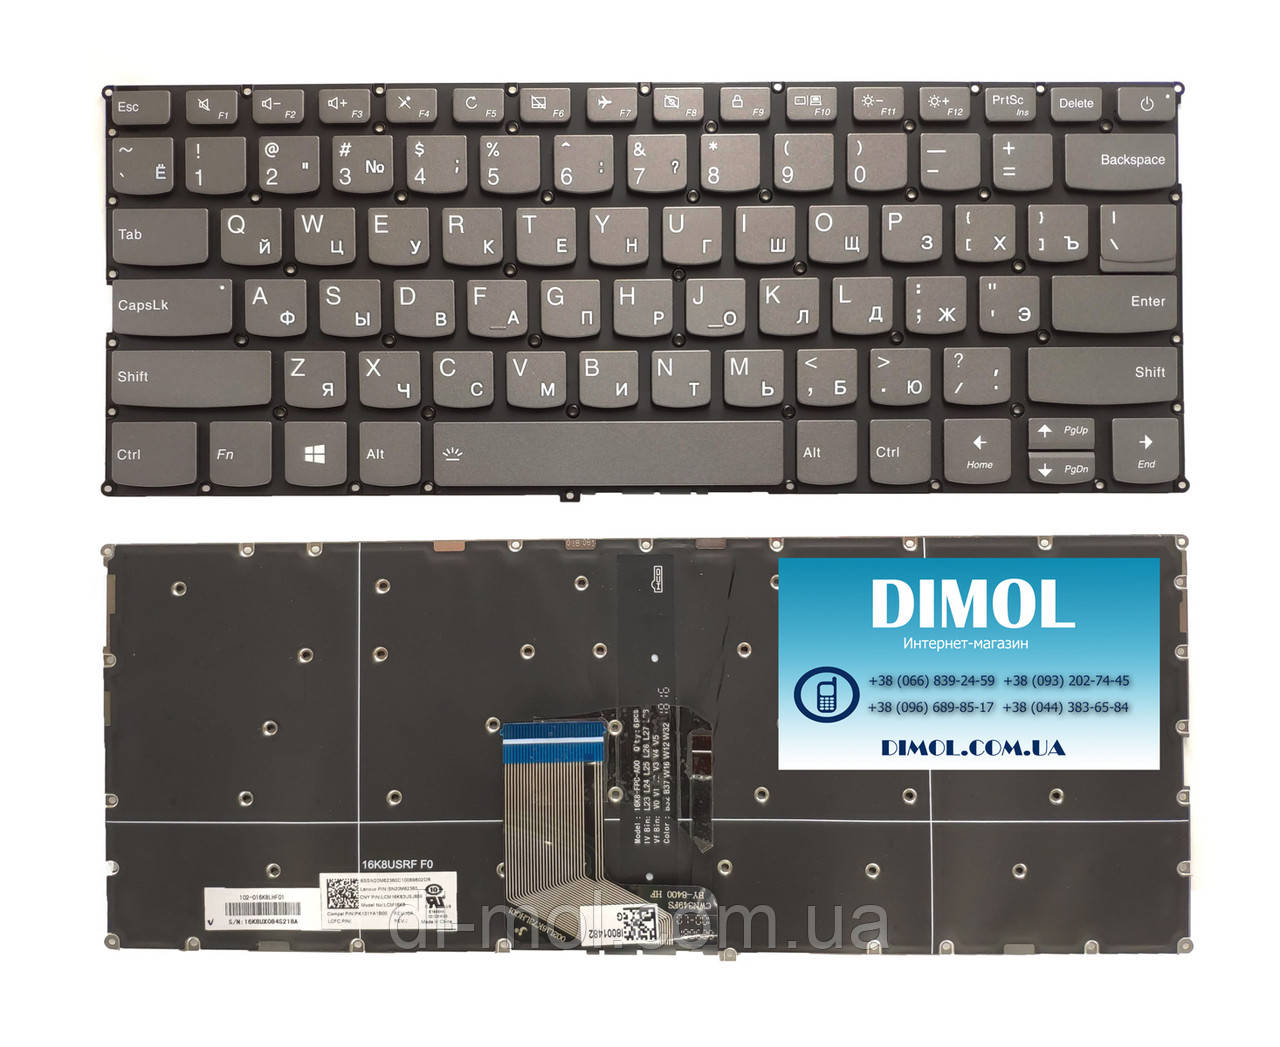 Оригинальная клавиатура для ноутбука Lenovo IdeaPad 320S-13IKB, 720S-14IKB series, rus, gray, подсветка